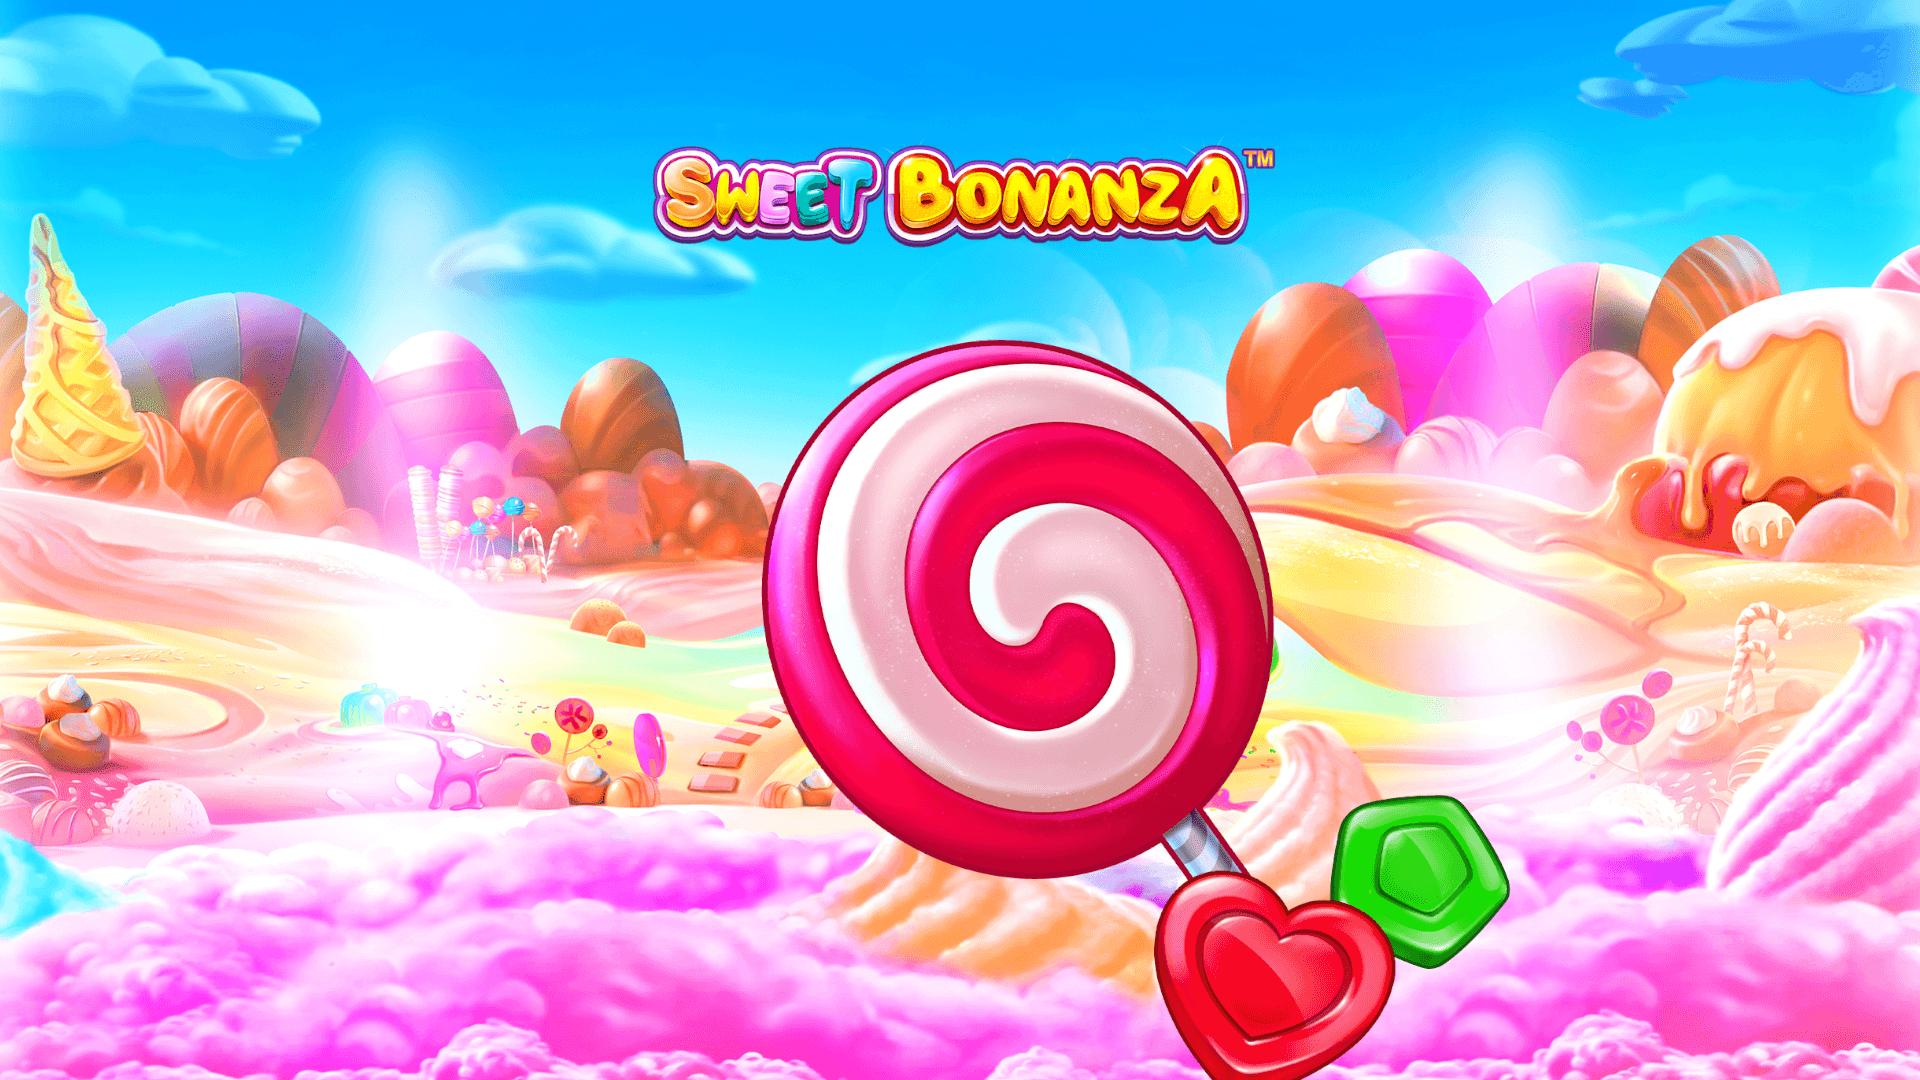 Play sweet bonanza with Bonuses